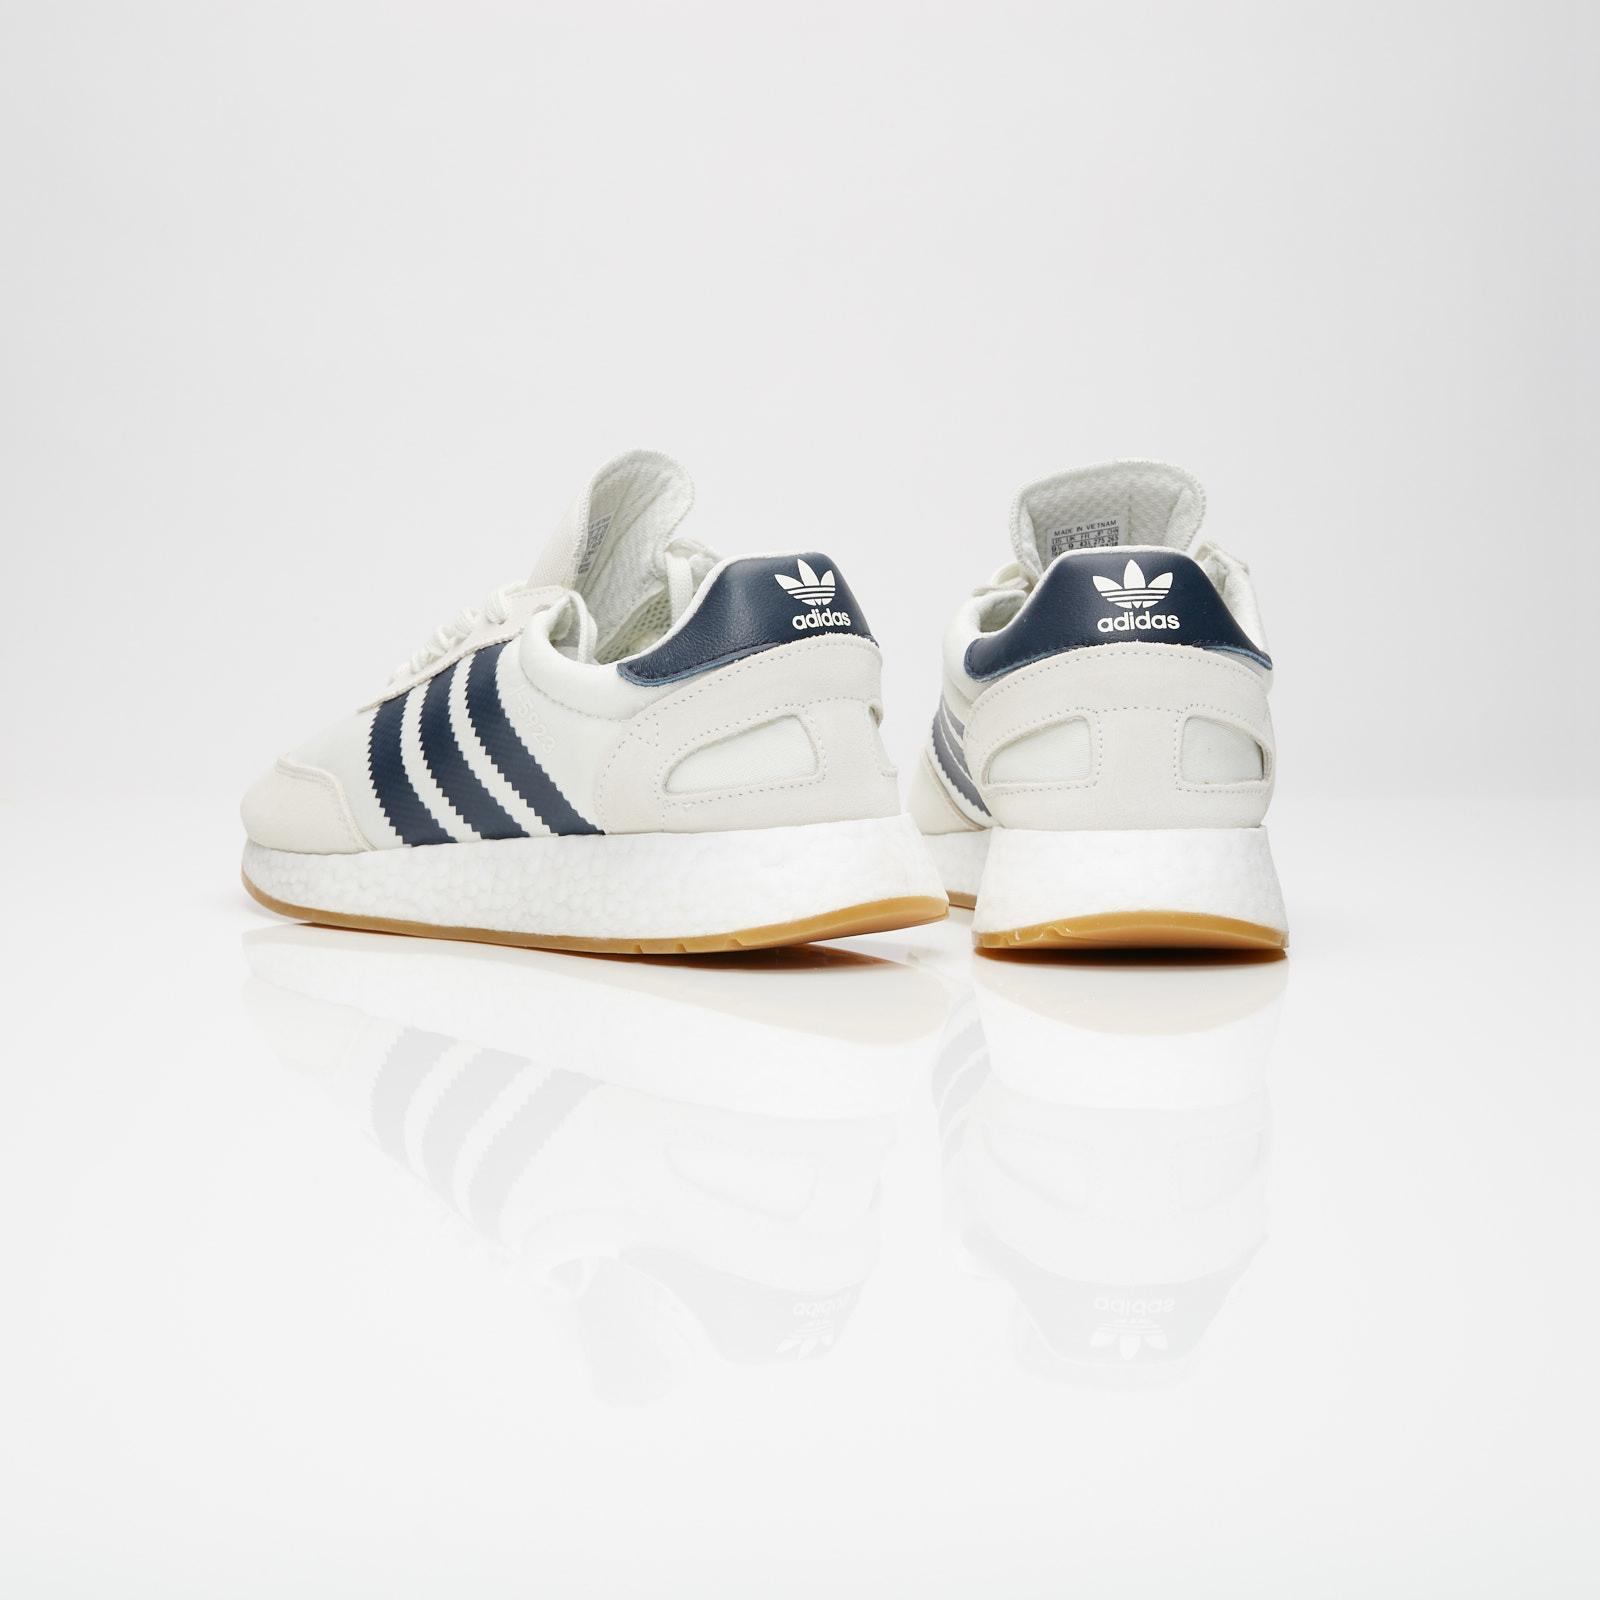 new concept ec9d8 c319c adidas I-5923 - B37947 - Sneakersnstuff   sneakers   streetwear online  since 1999